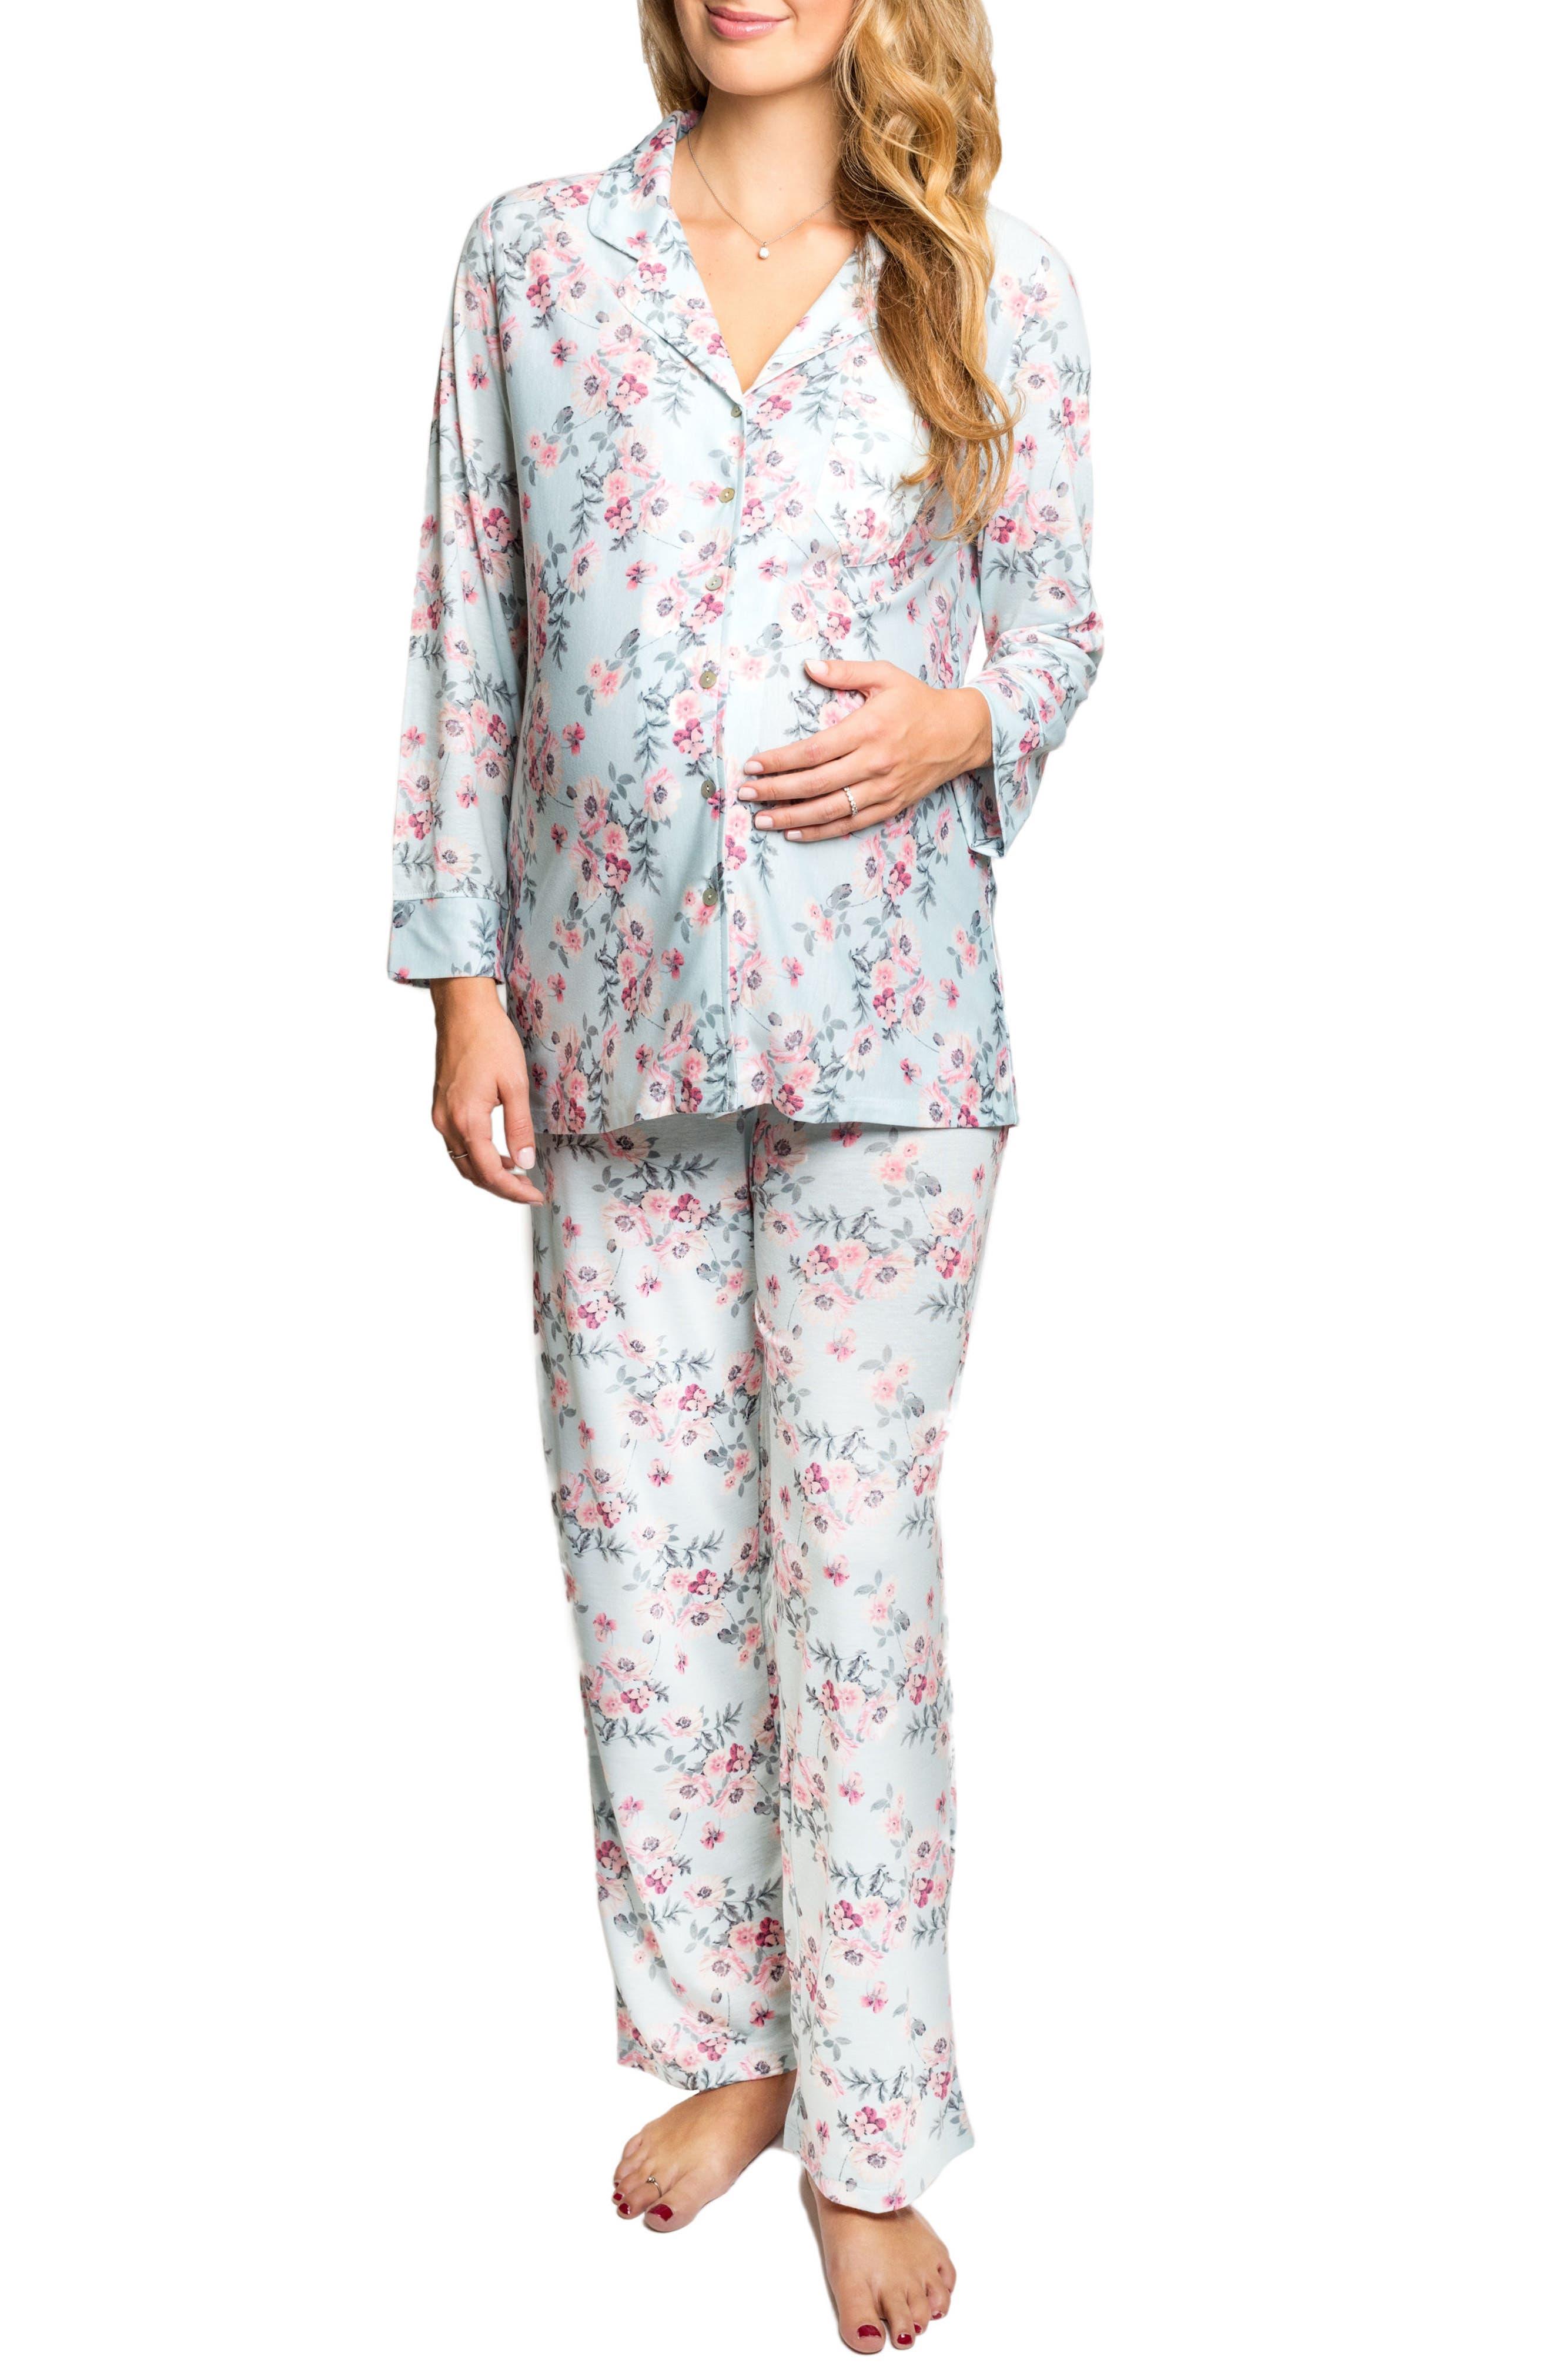 Alternate Image 1 Selected - Everly Grey Helena Maternity/Nursing Pajamas